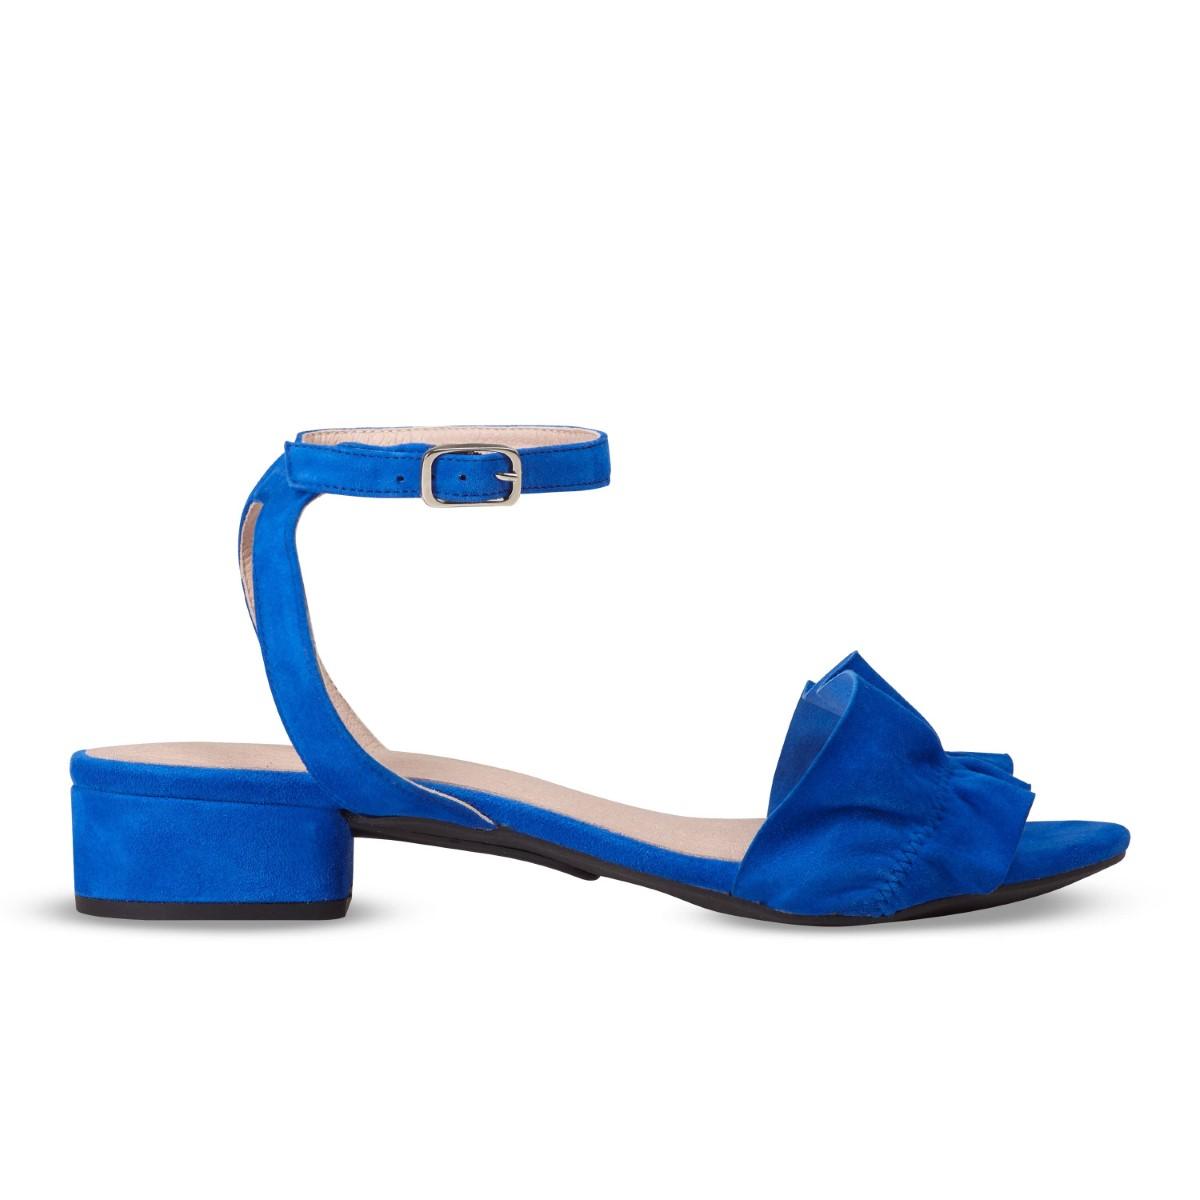 Blue Shell / Stiletto 10cm